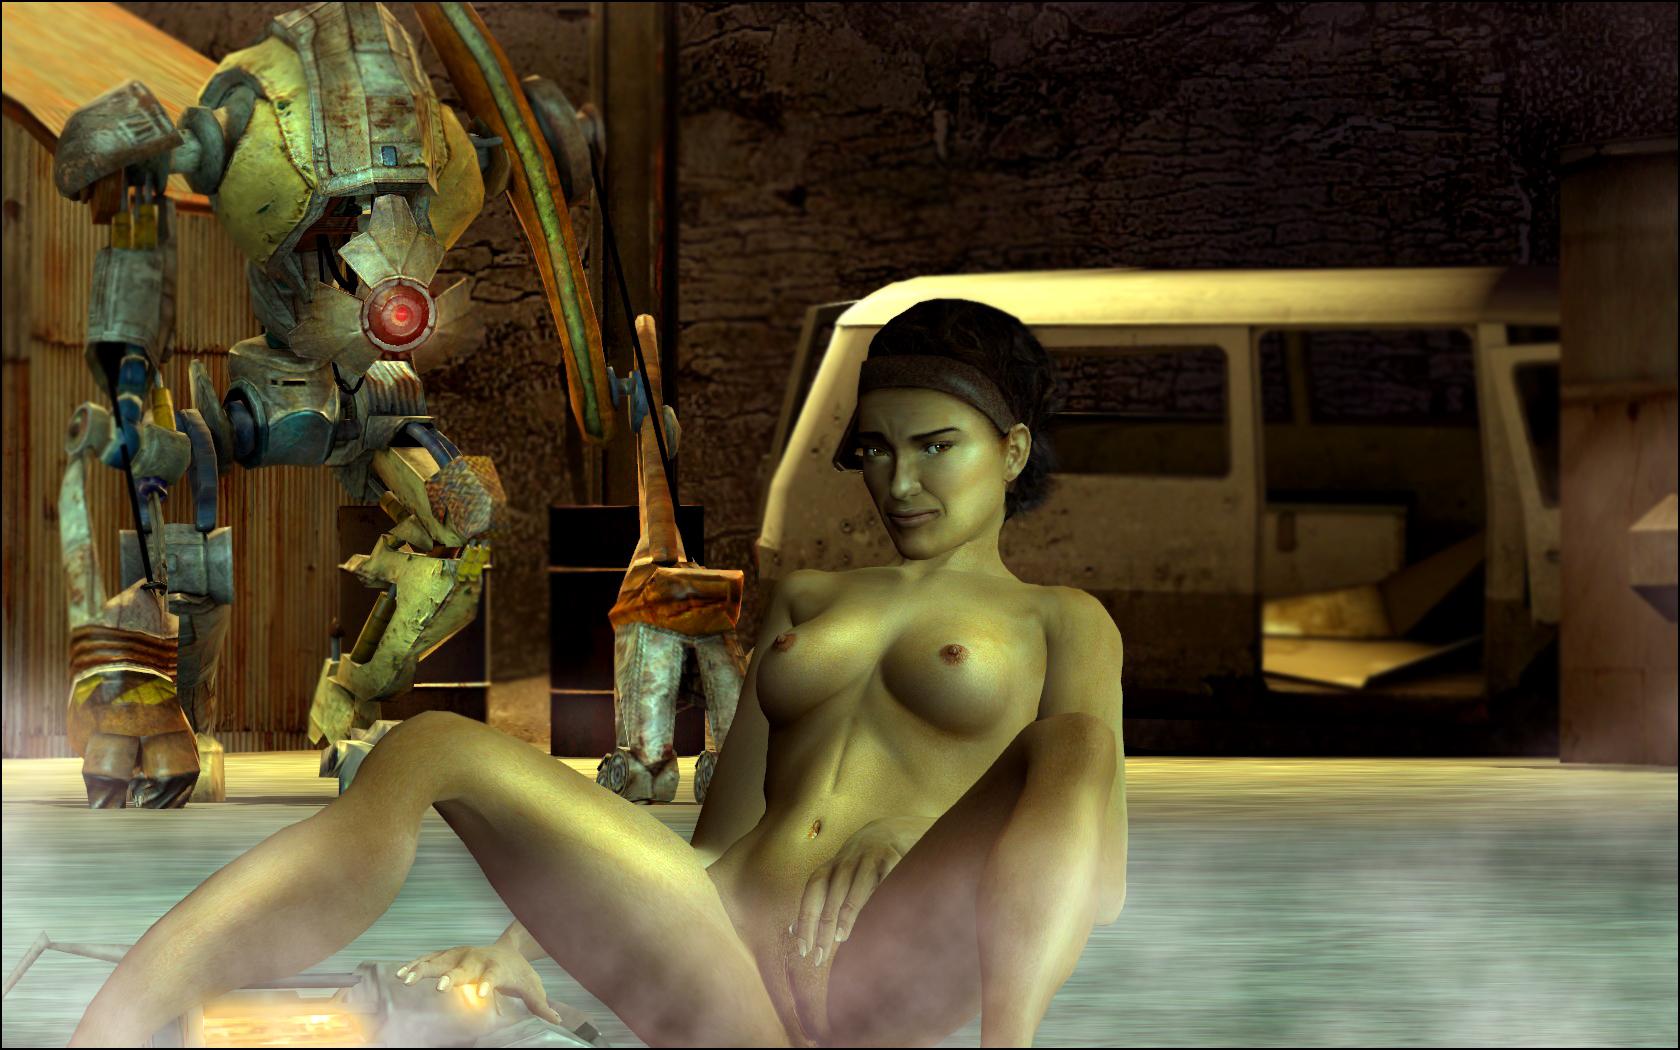 female 4 fallout nude mod Pokemon sun and moon vore